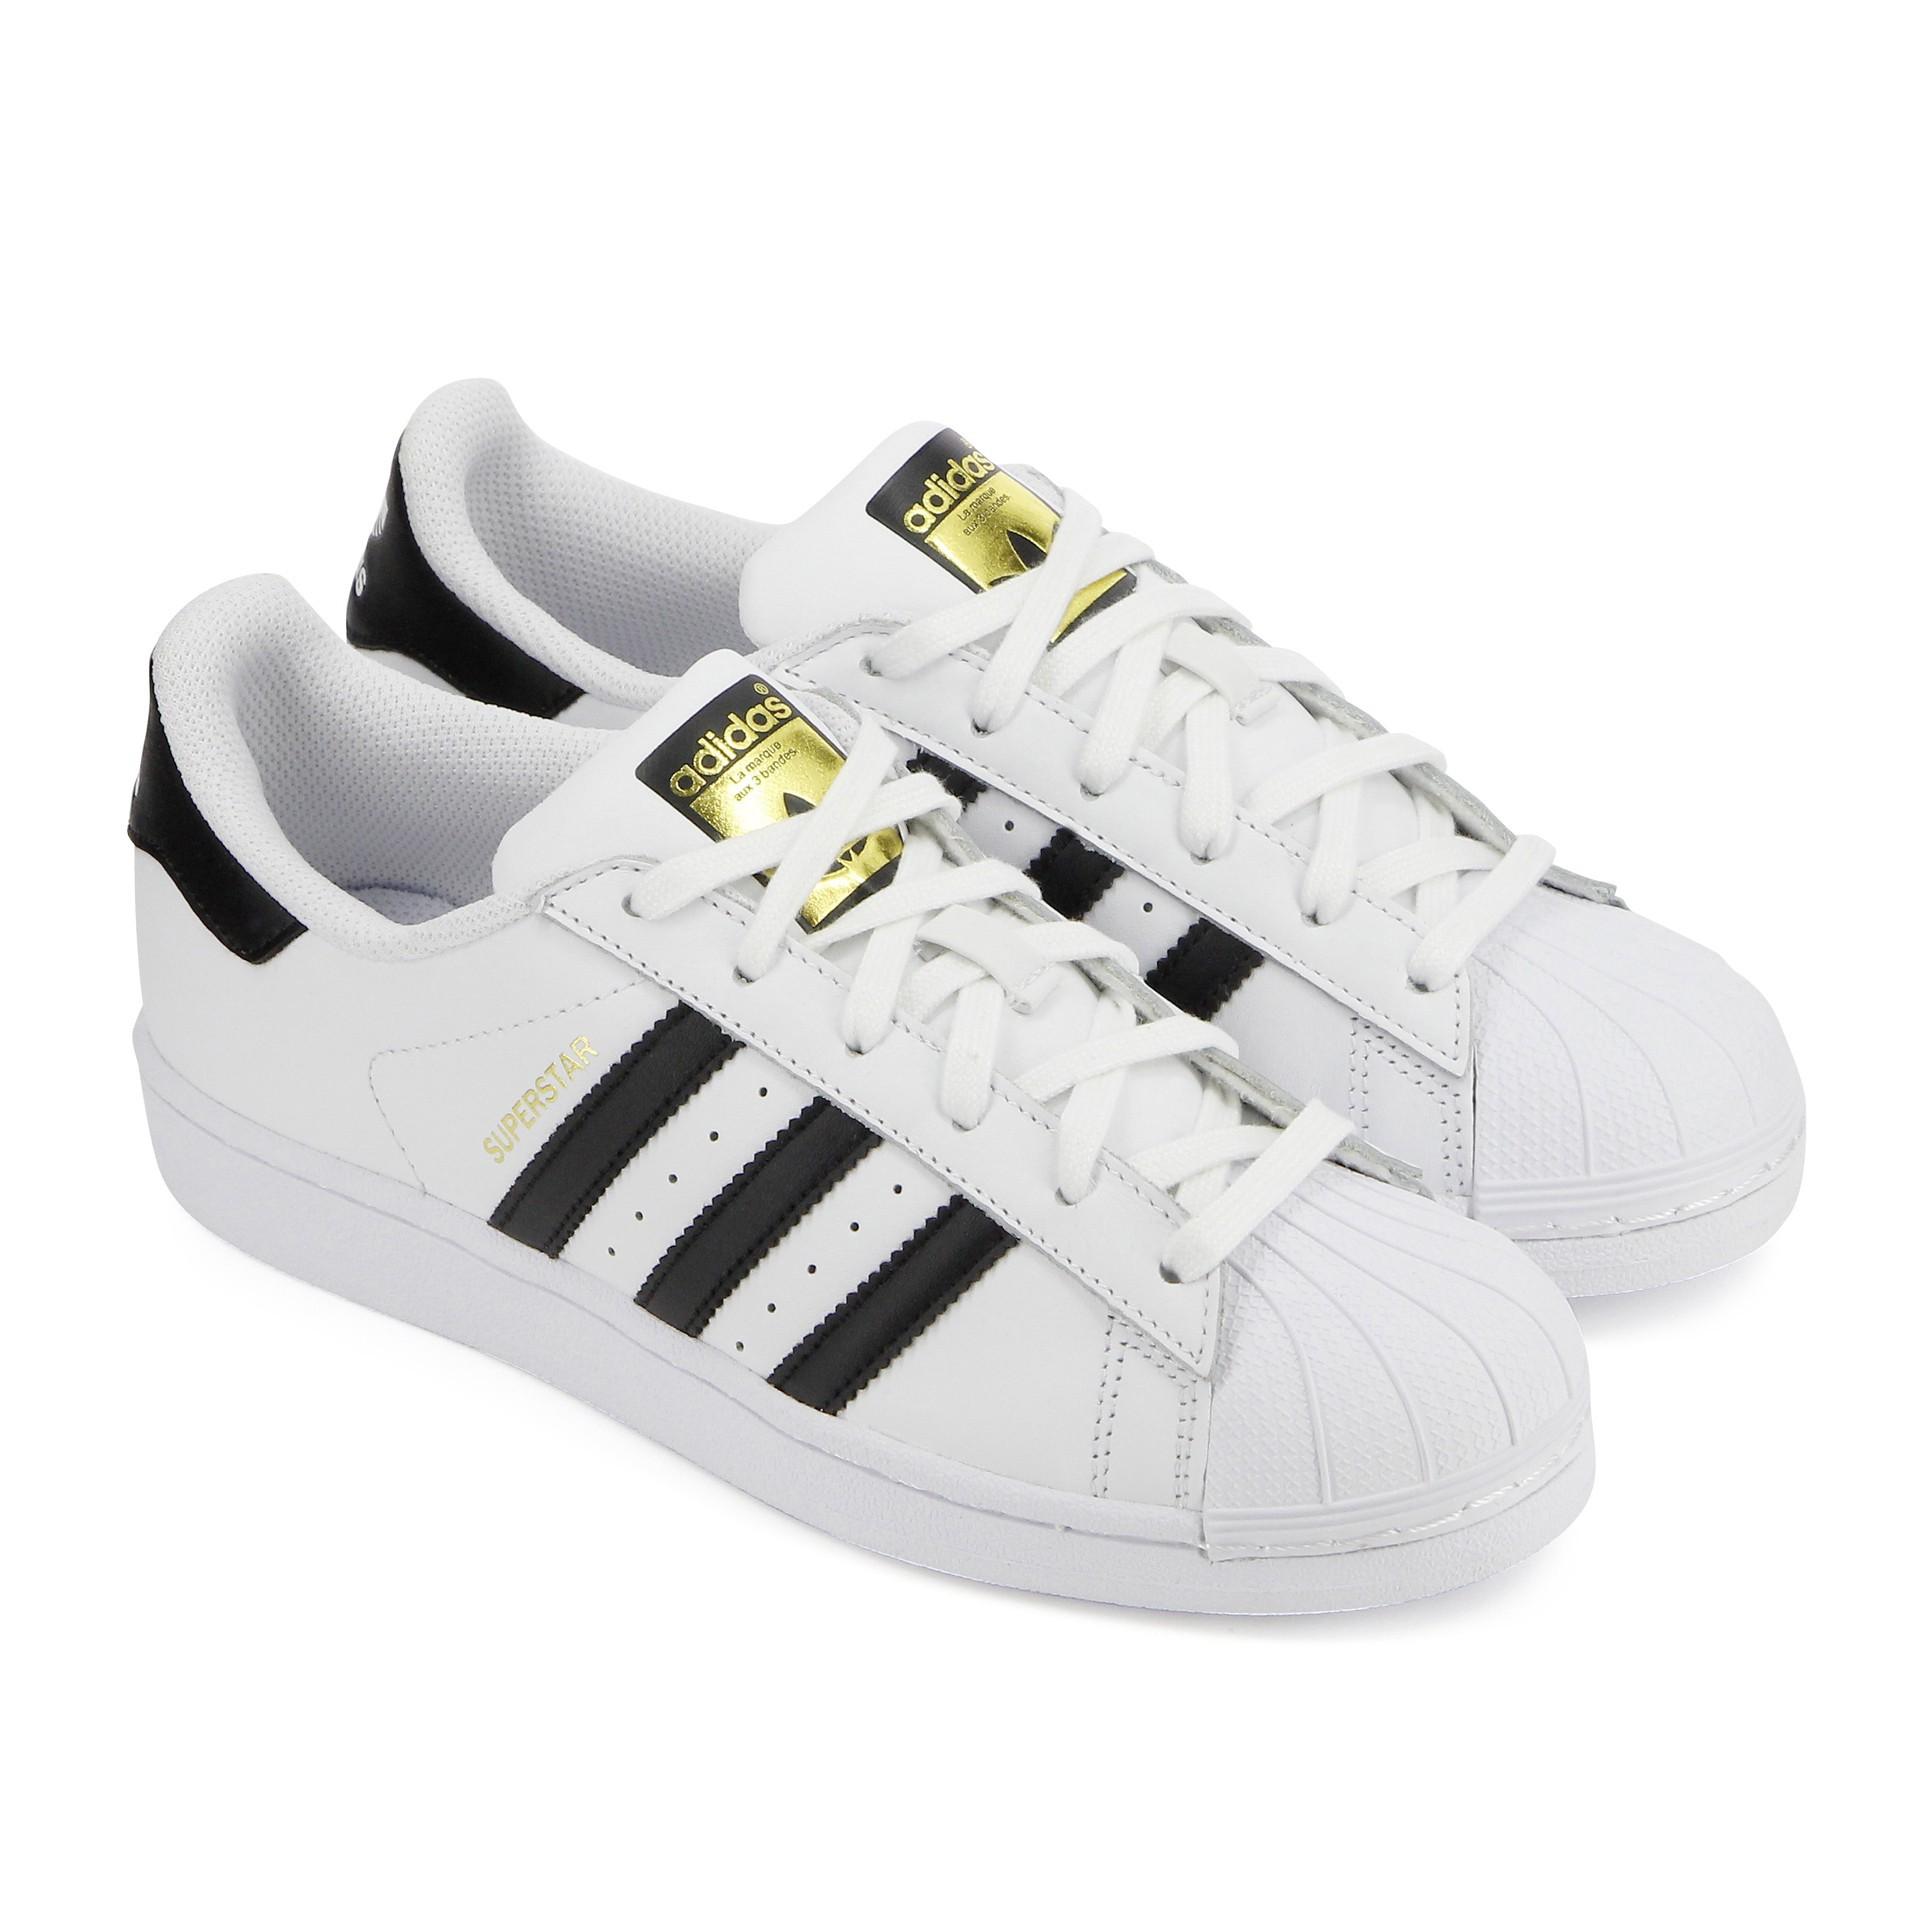 adidas chaussures femme 39